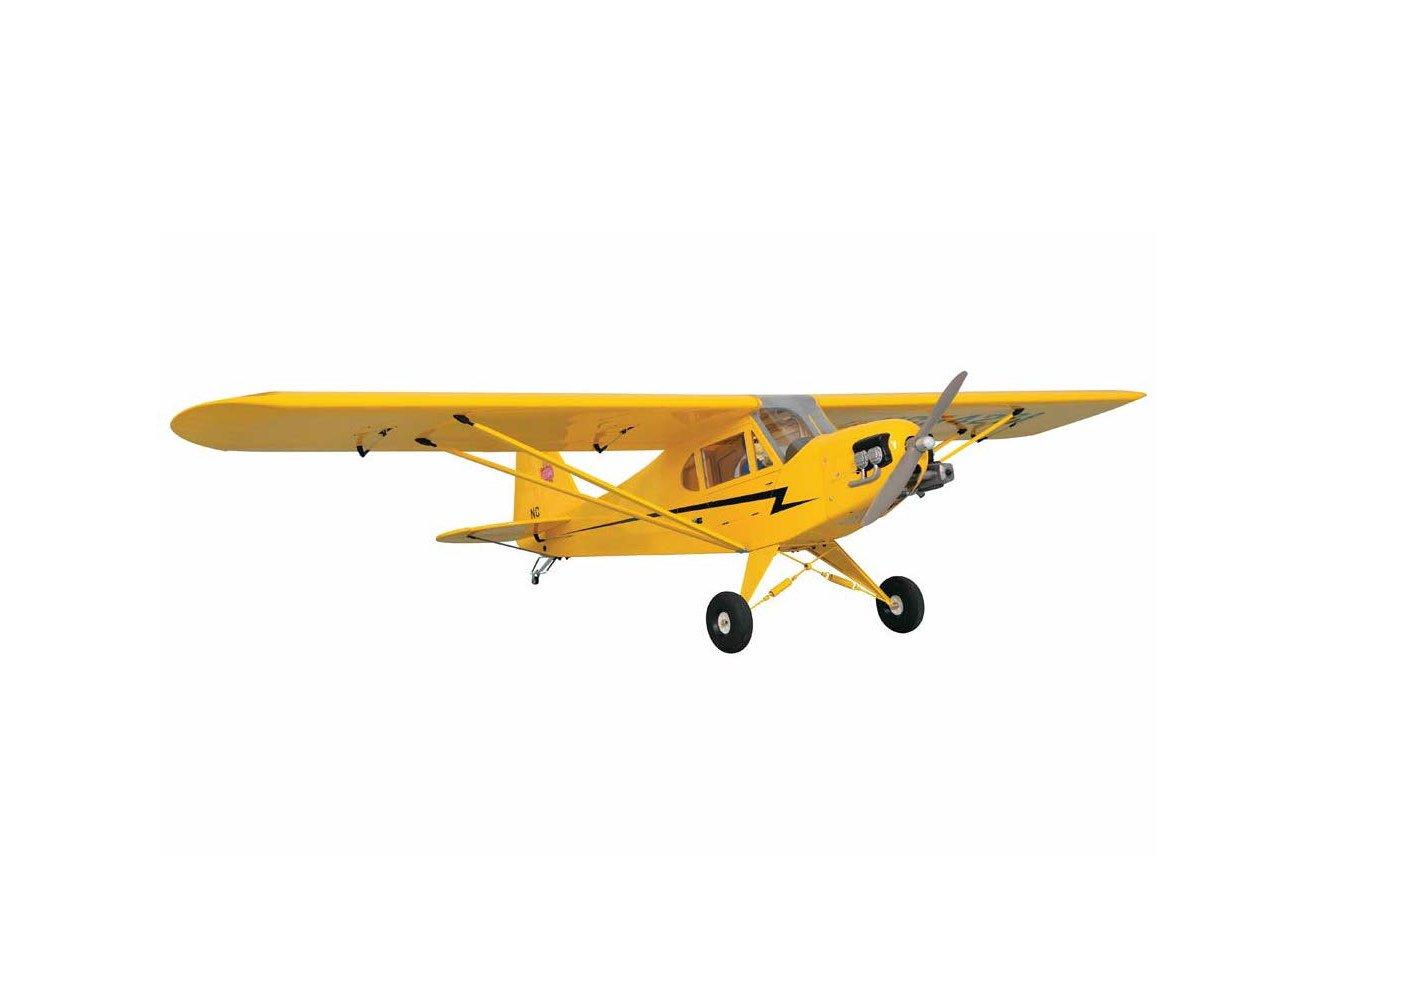 Remote Control 1-4 Scale Piper J-3 Cub